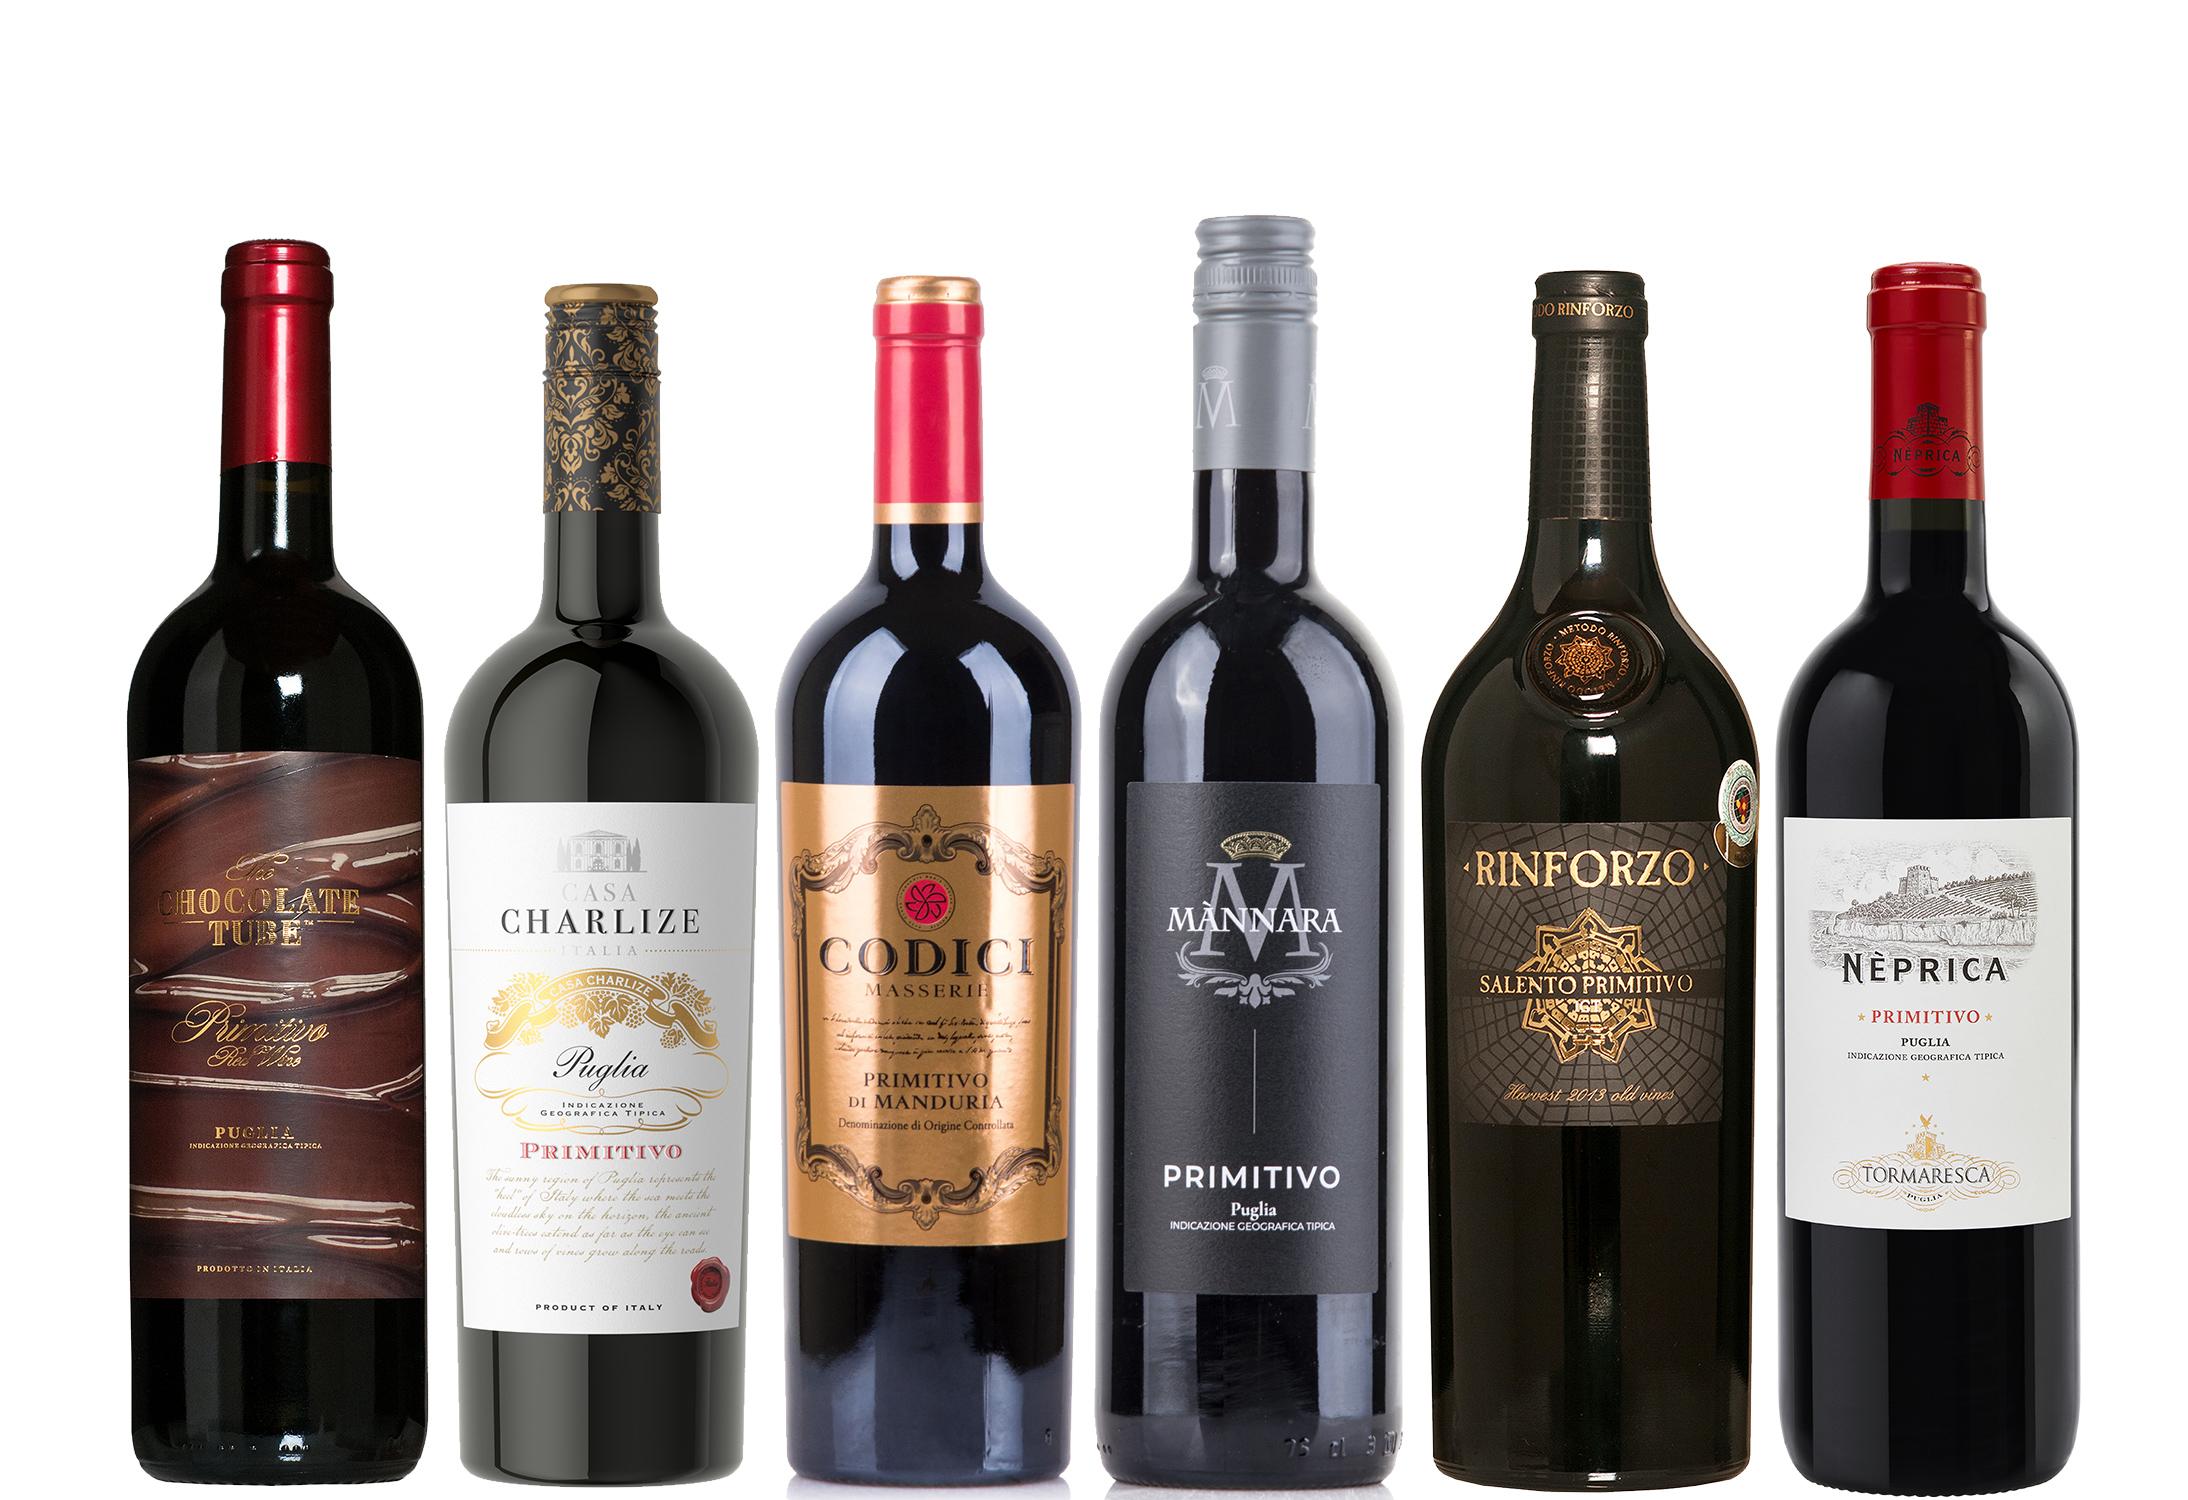 Primitivo veinid